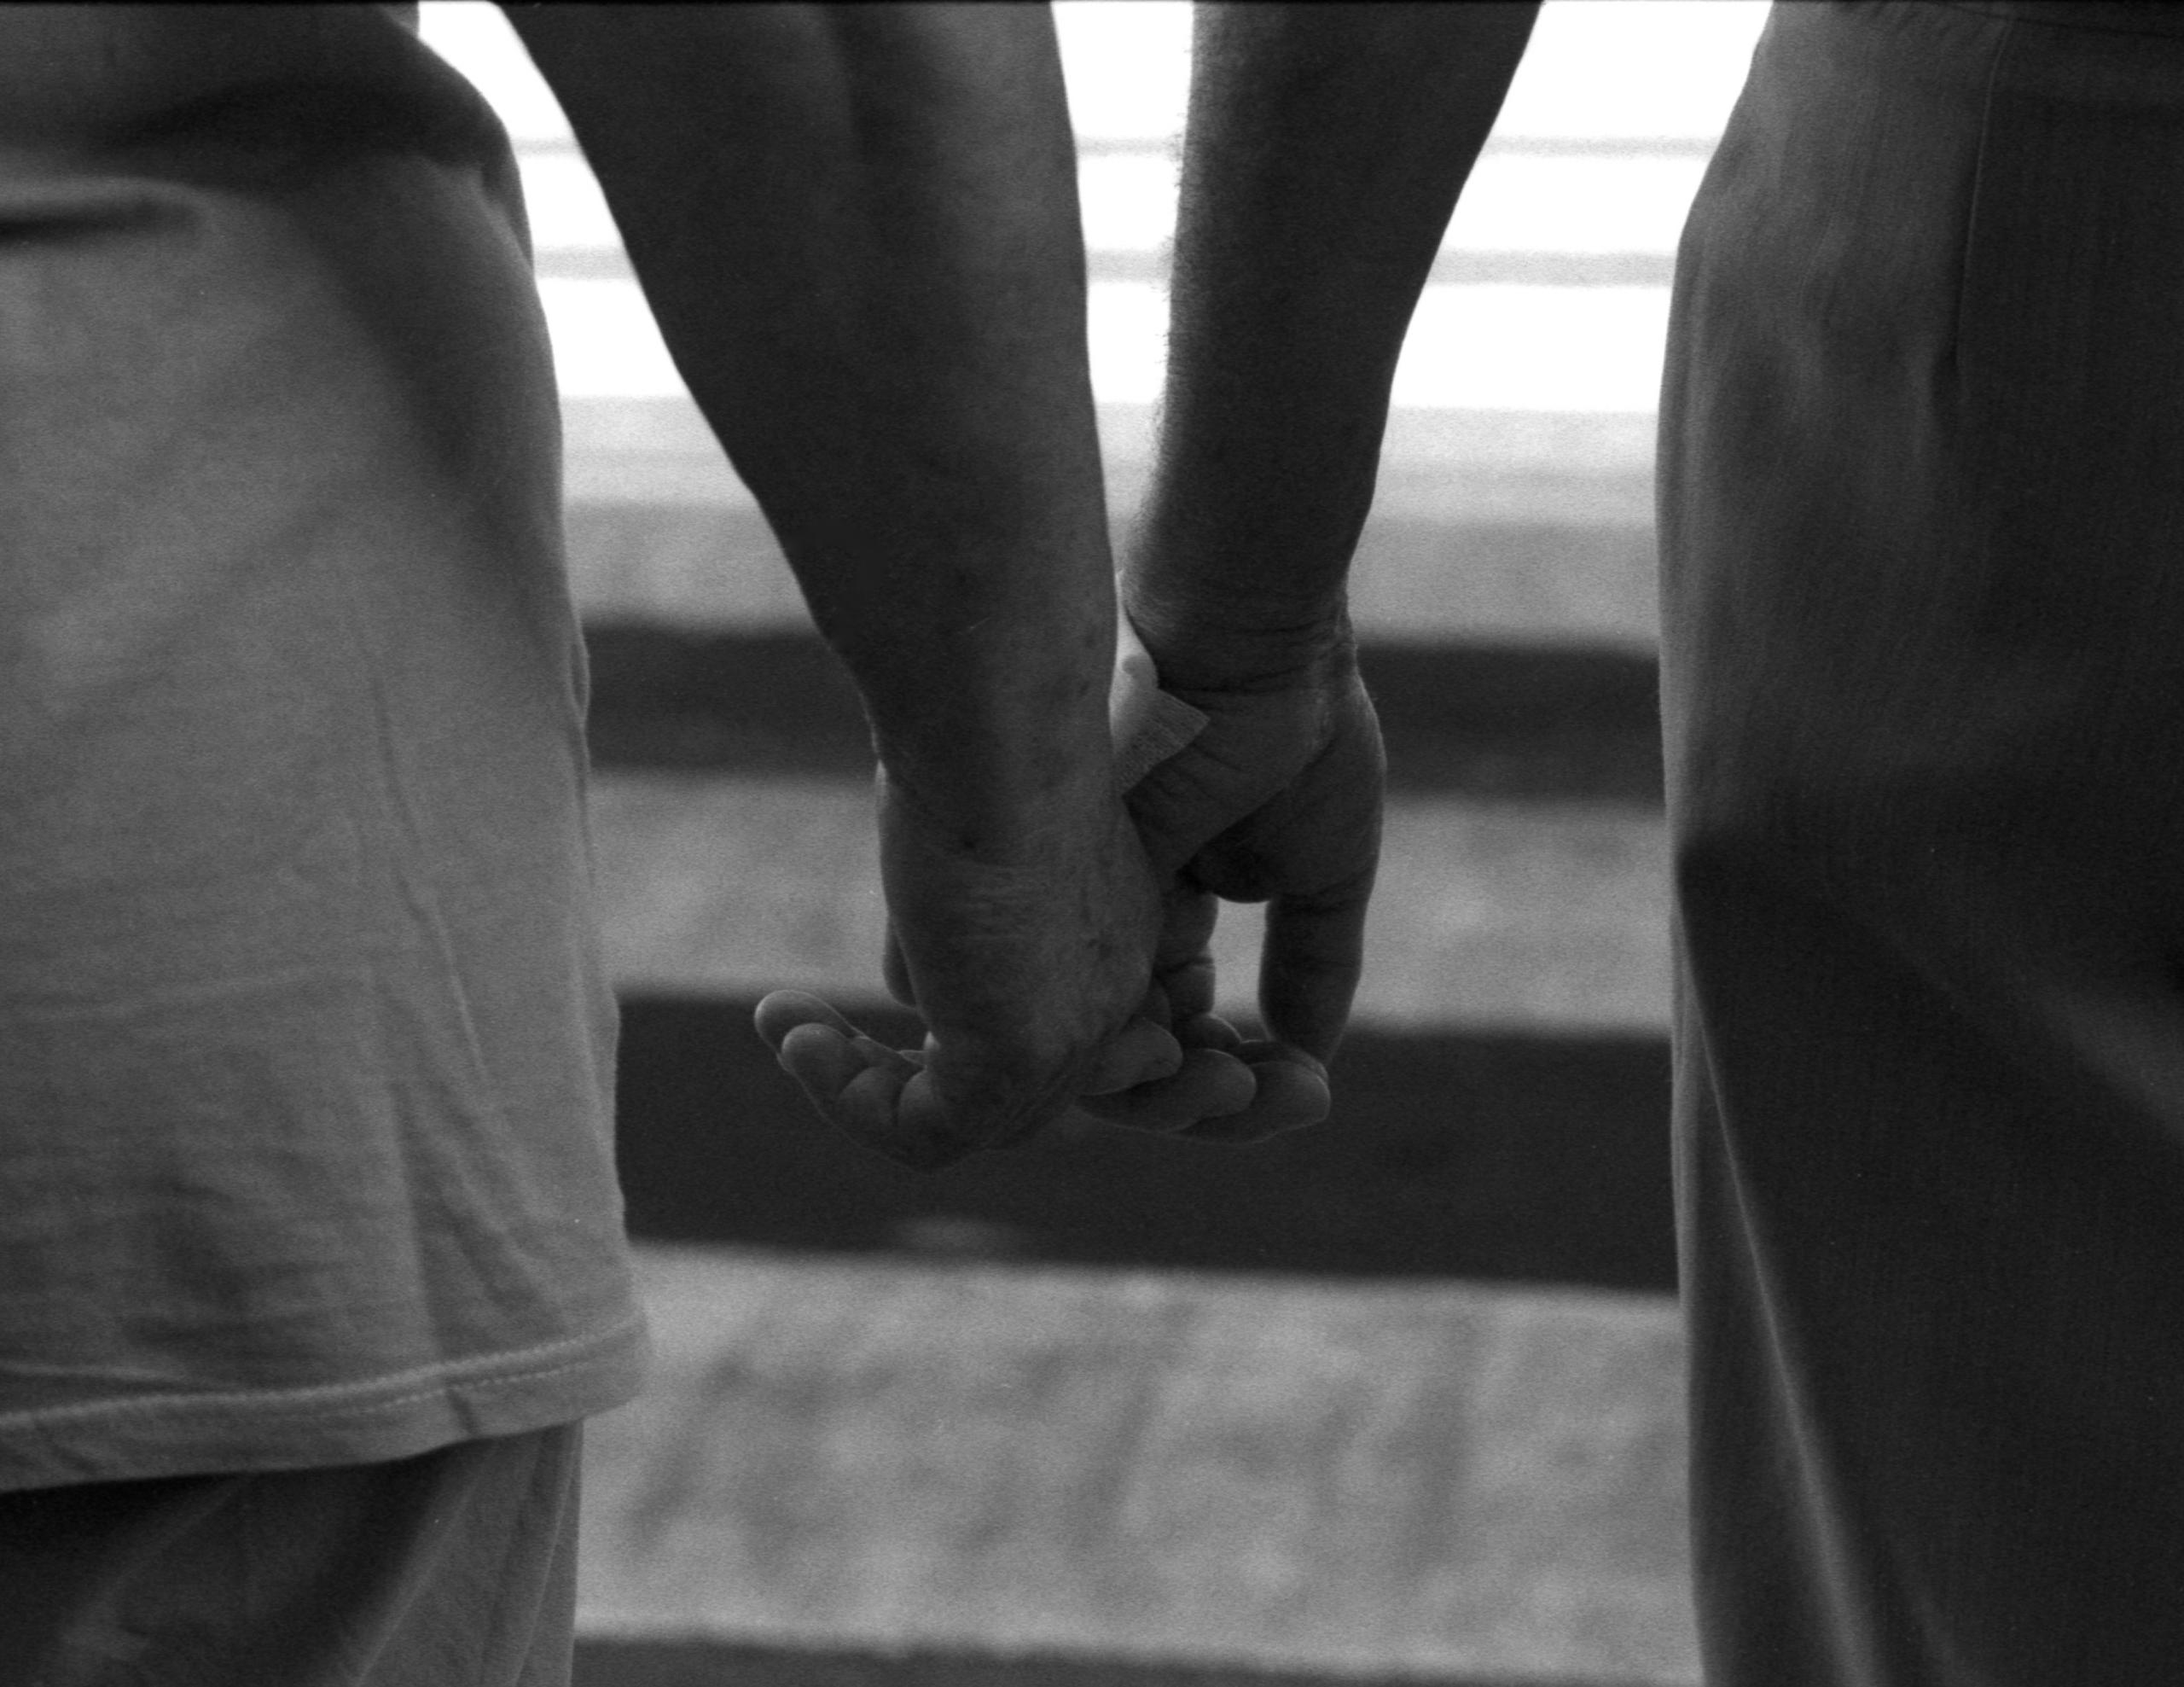 Mature love - photography, filmphotography - lxchance | ello